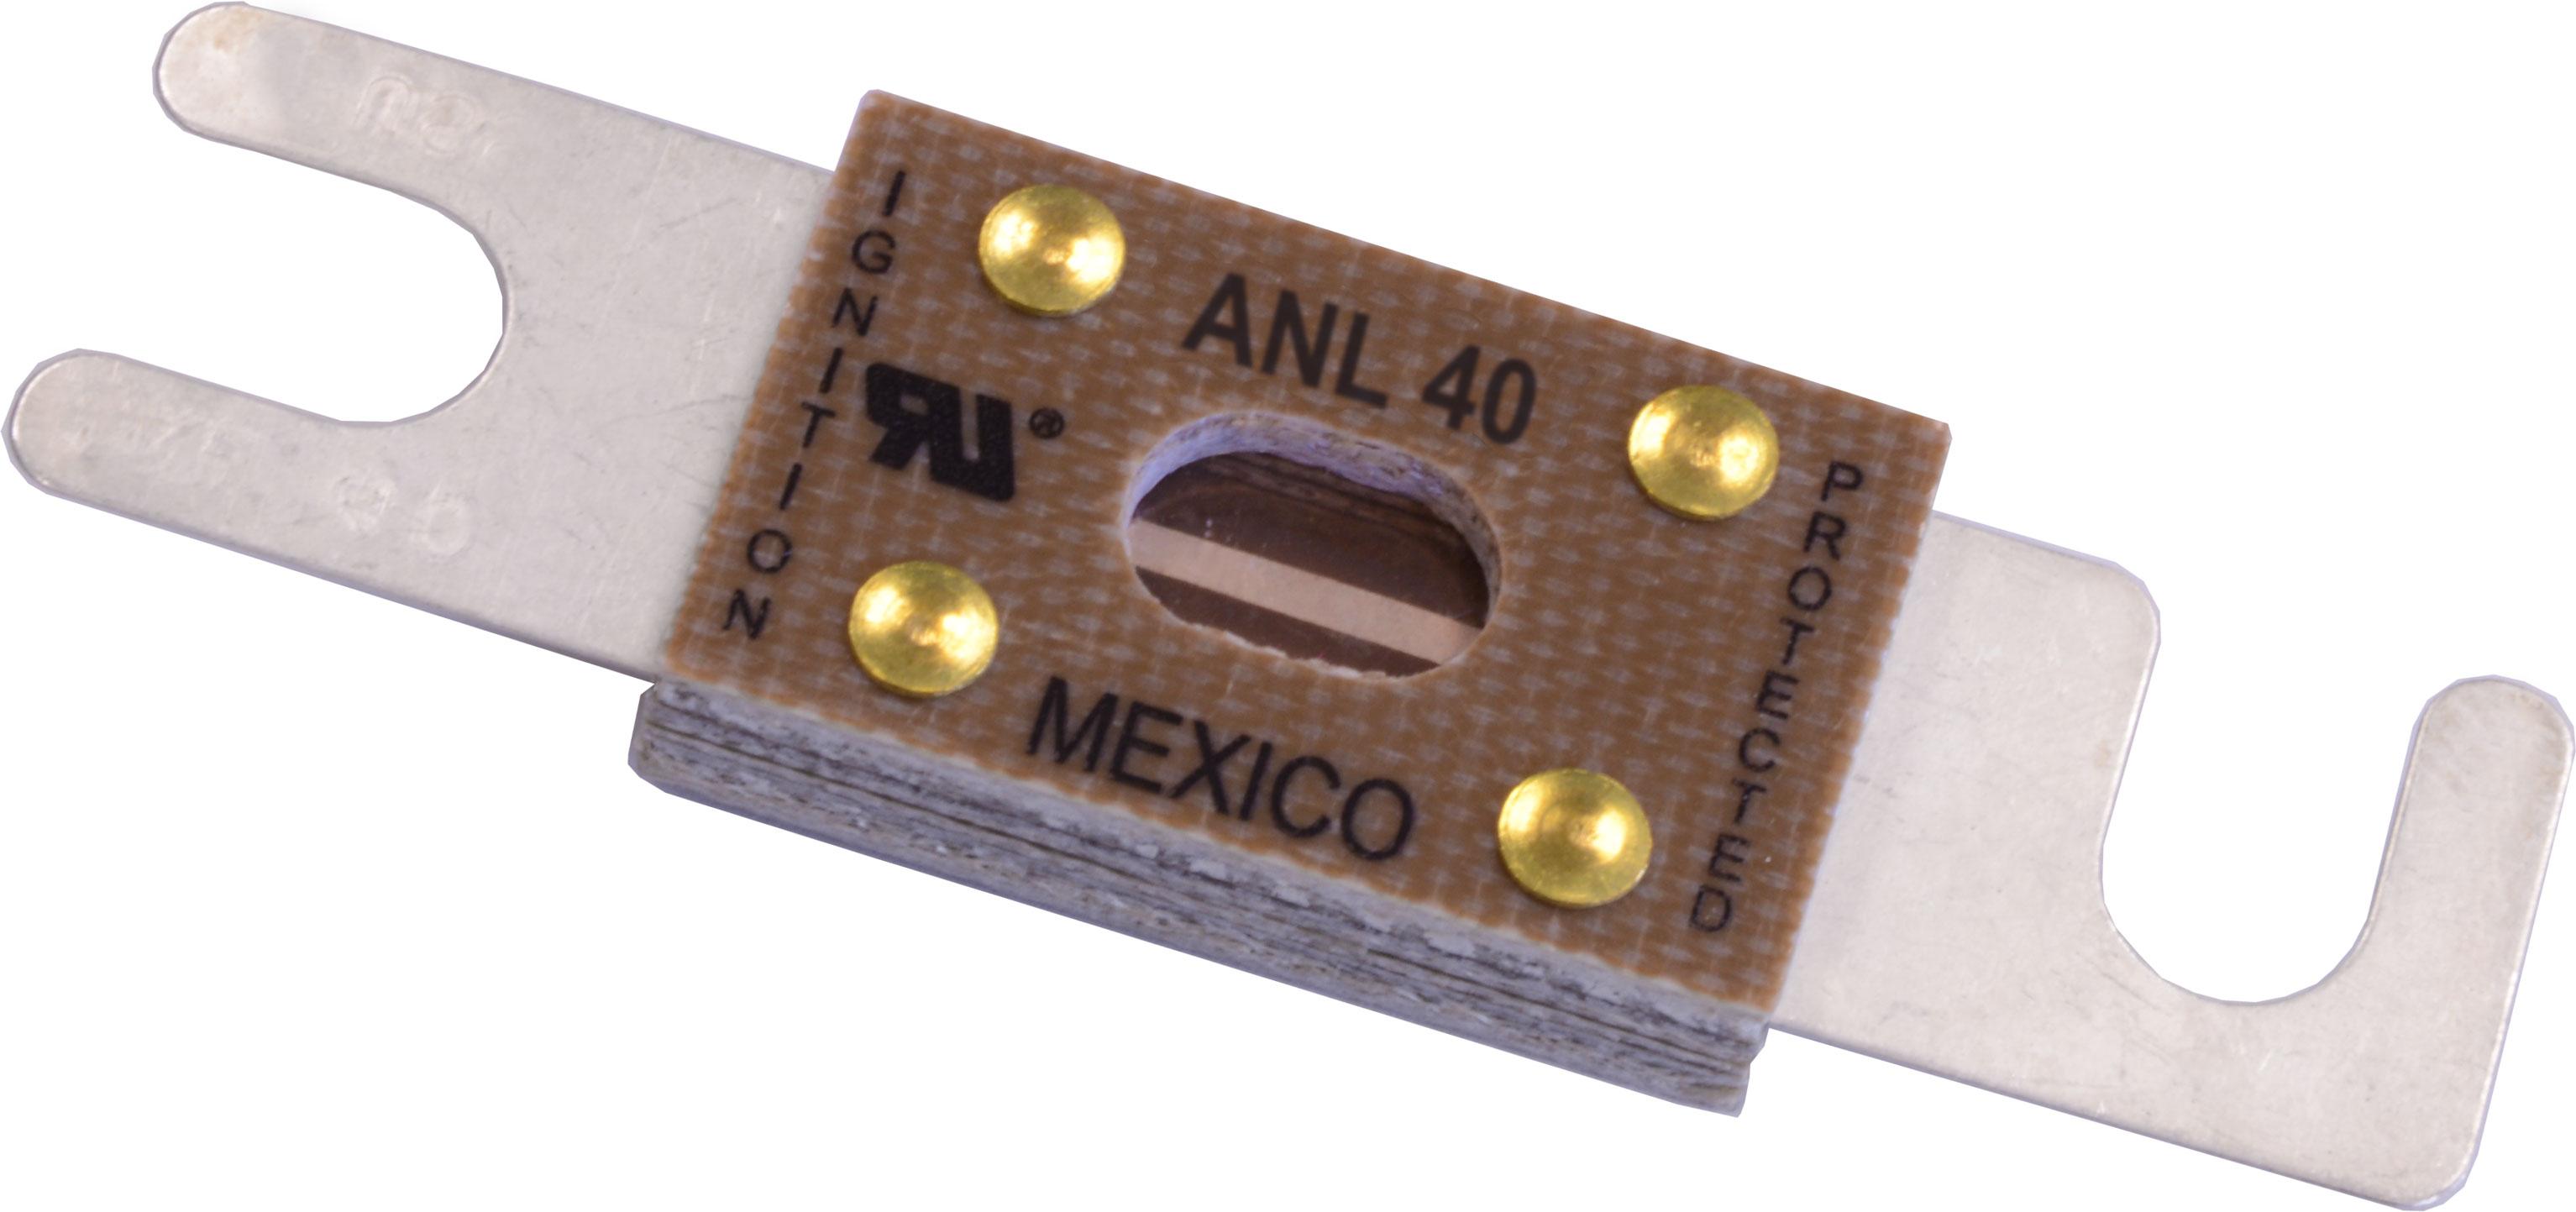 Anl Fuse - 40 Amp